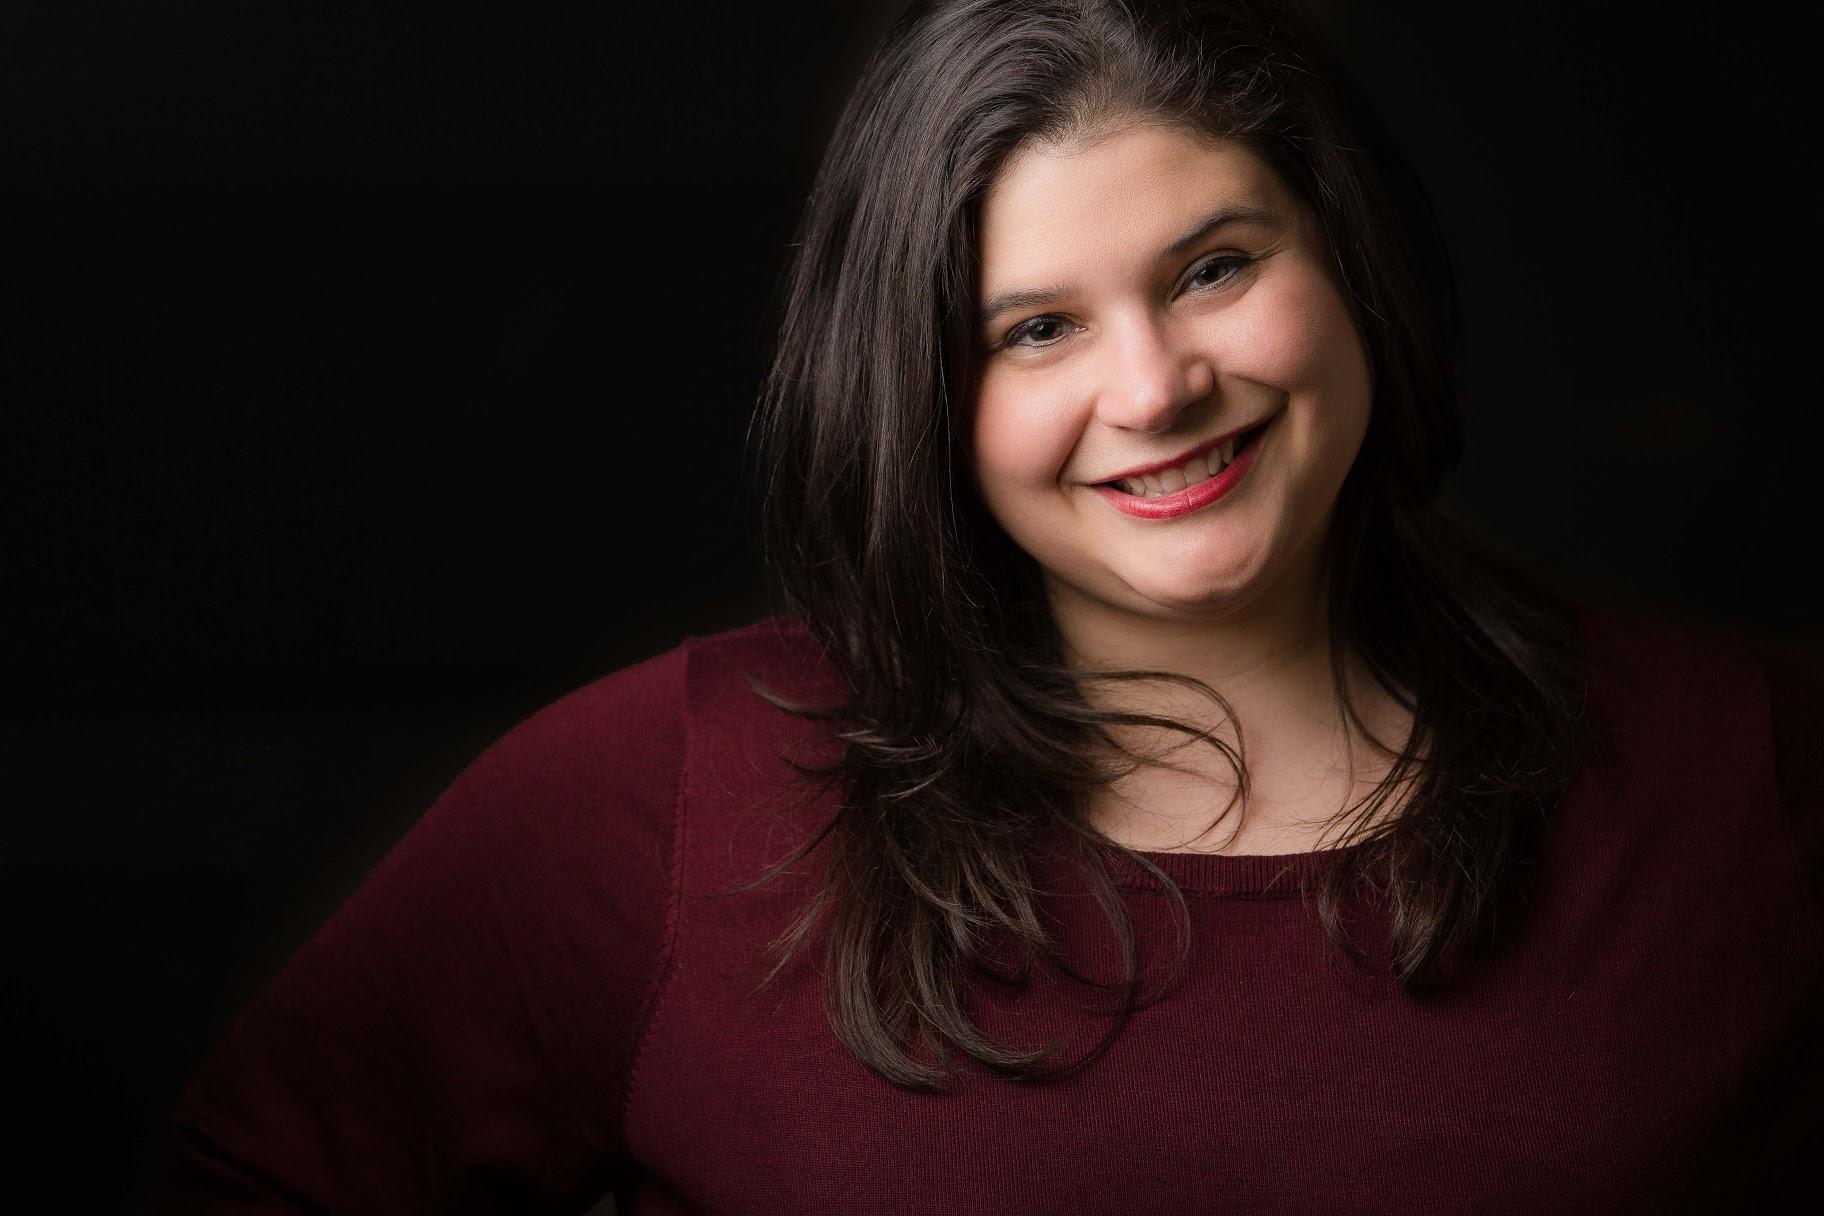 Lauren Cantrell Salerno